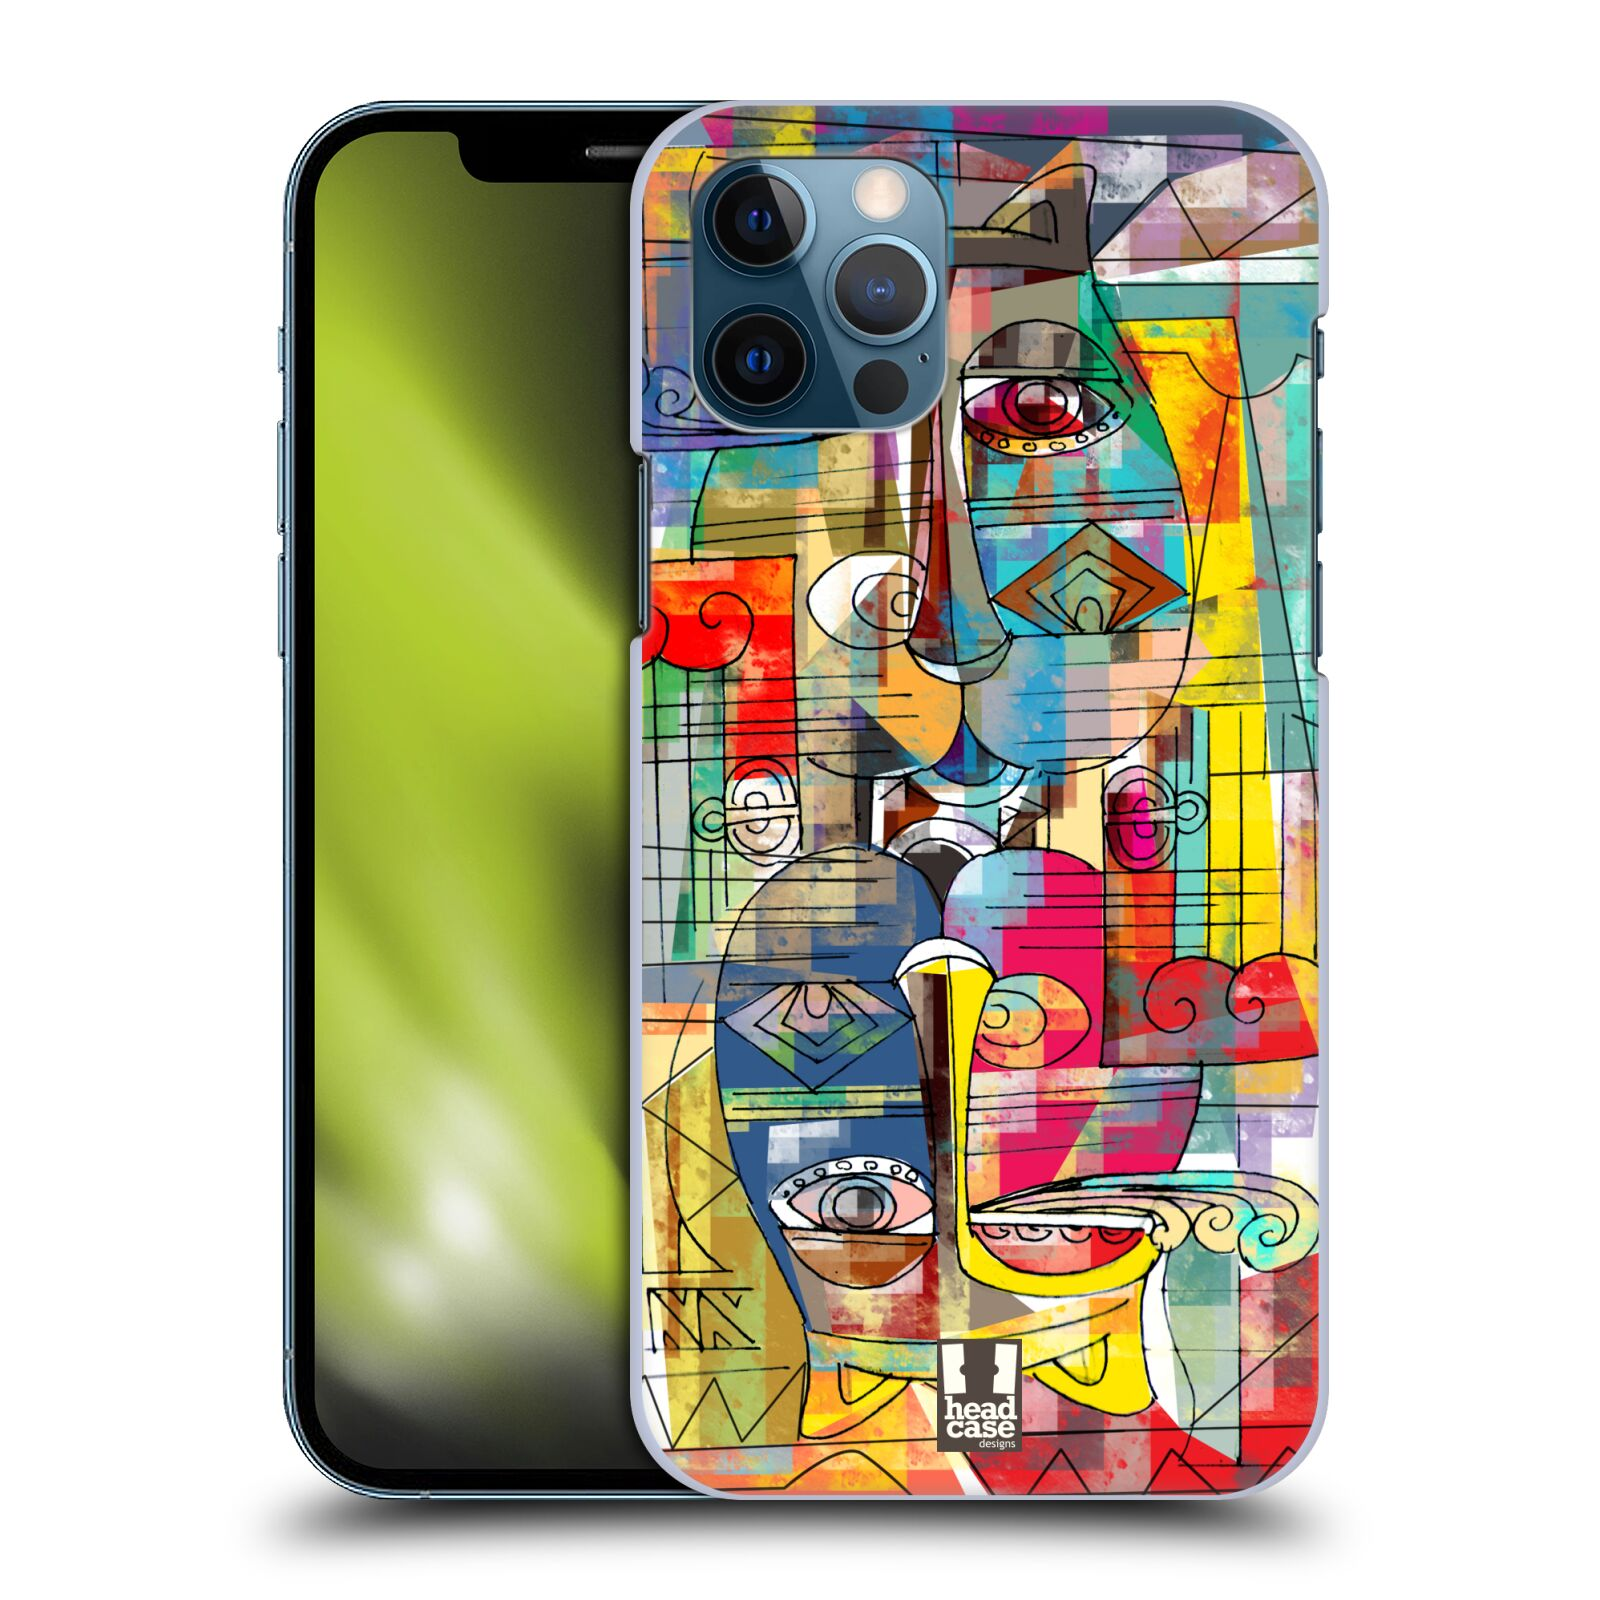 Plastové pouzdro na mobil Apple iPhone 12 / 12 Pro - Head Case - AZTEC MANX